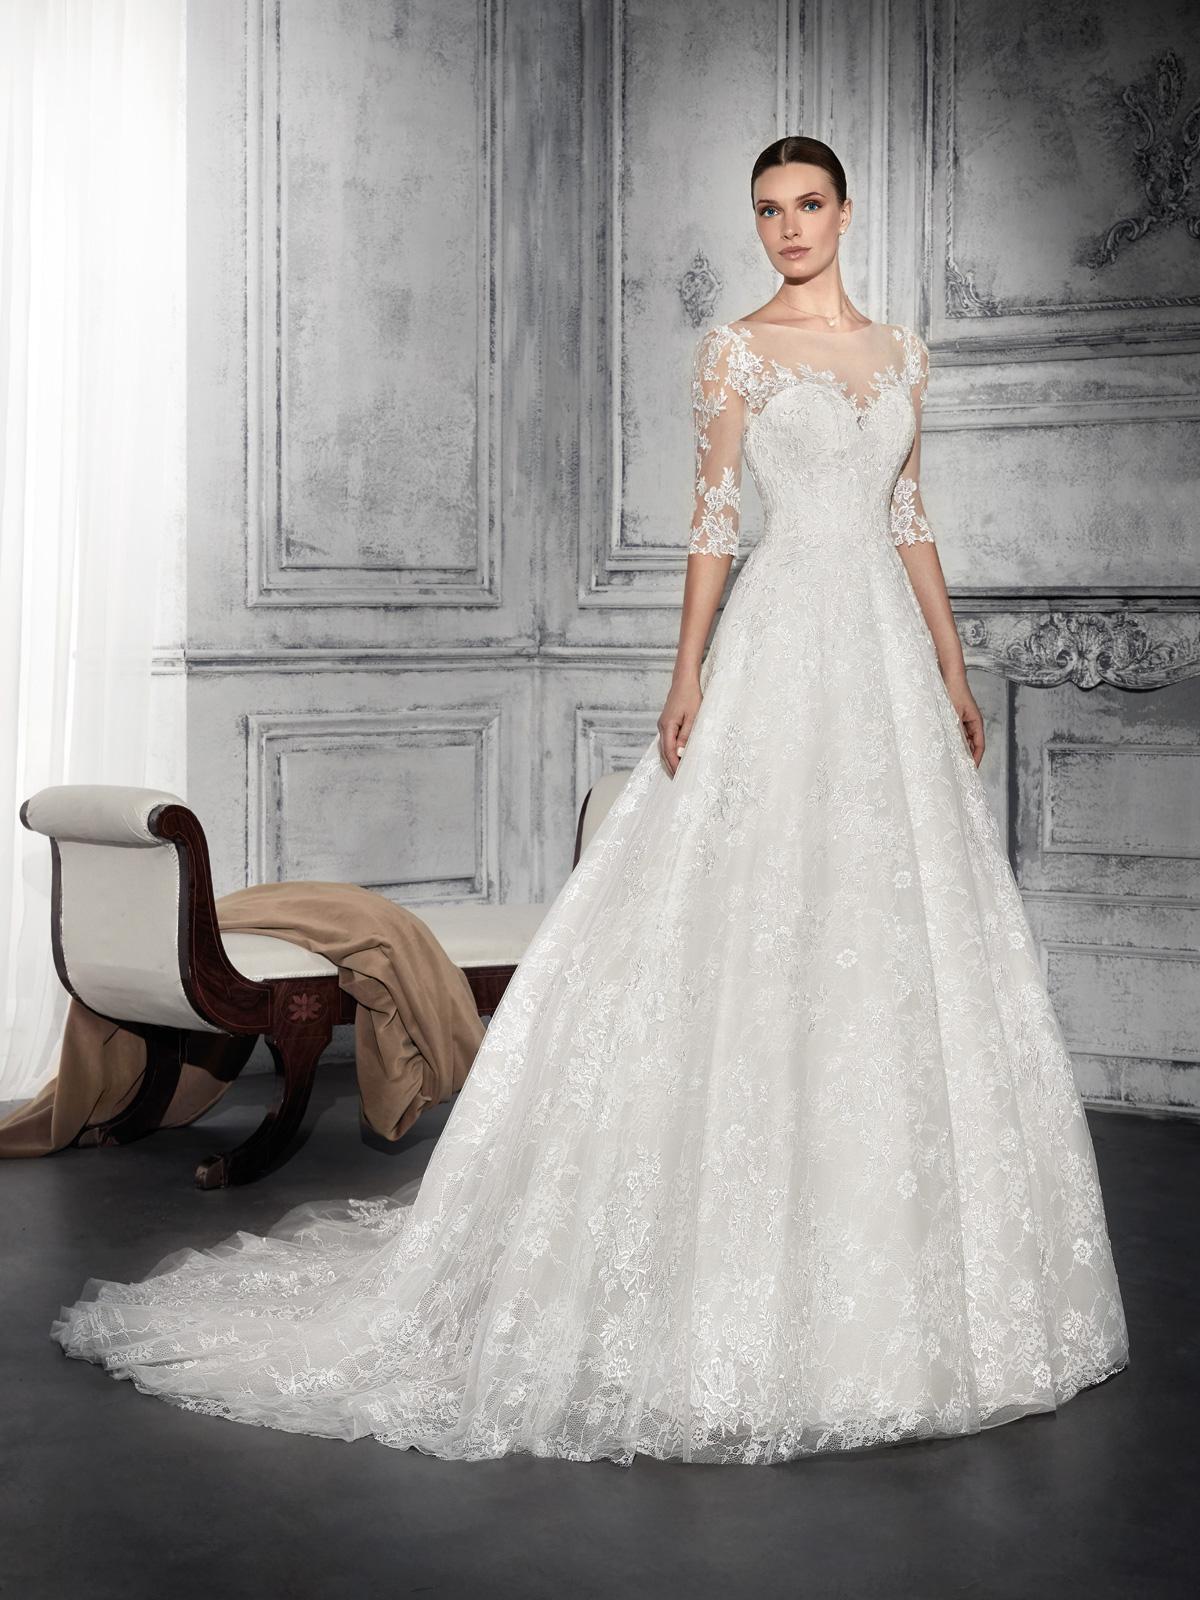 Vestido de Noiva em renda e belíssimo decote ombro a ombro. A saia é toda em renda importada. Romântico e delicado este vestido é para arrasar !!